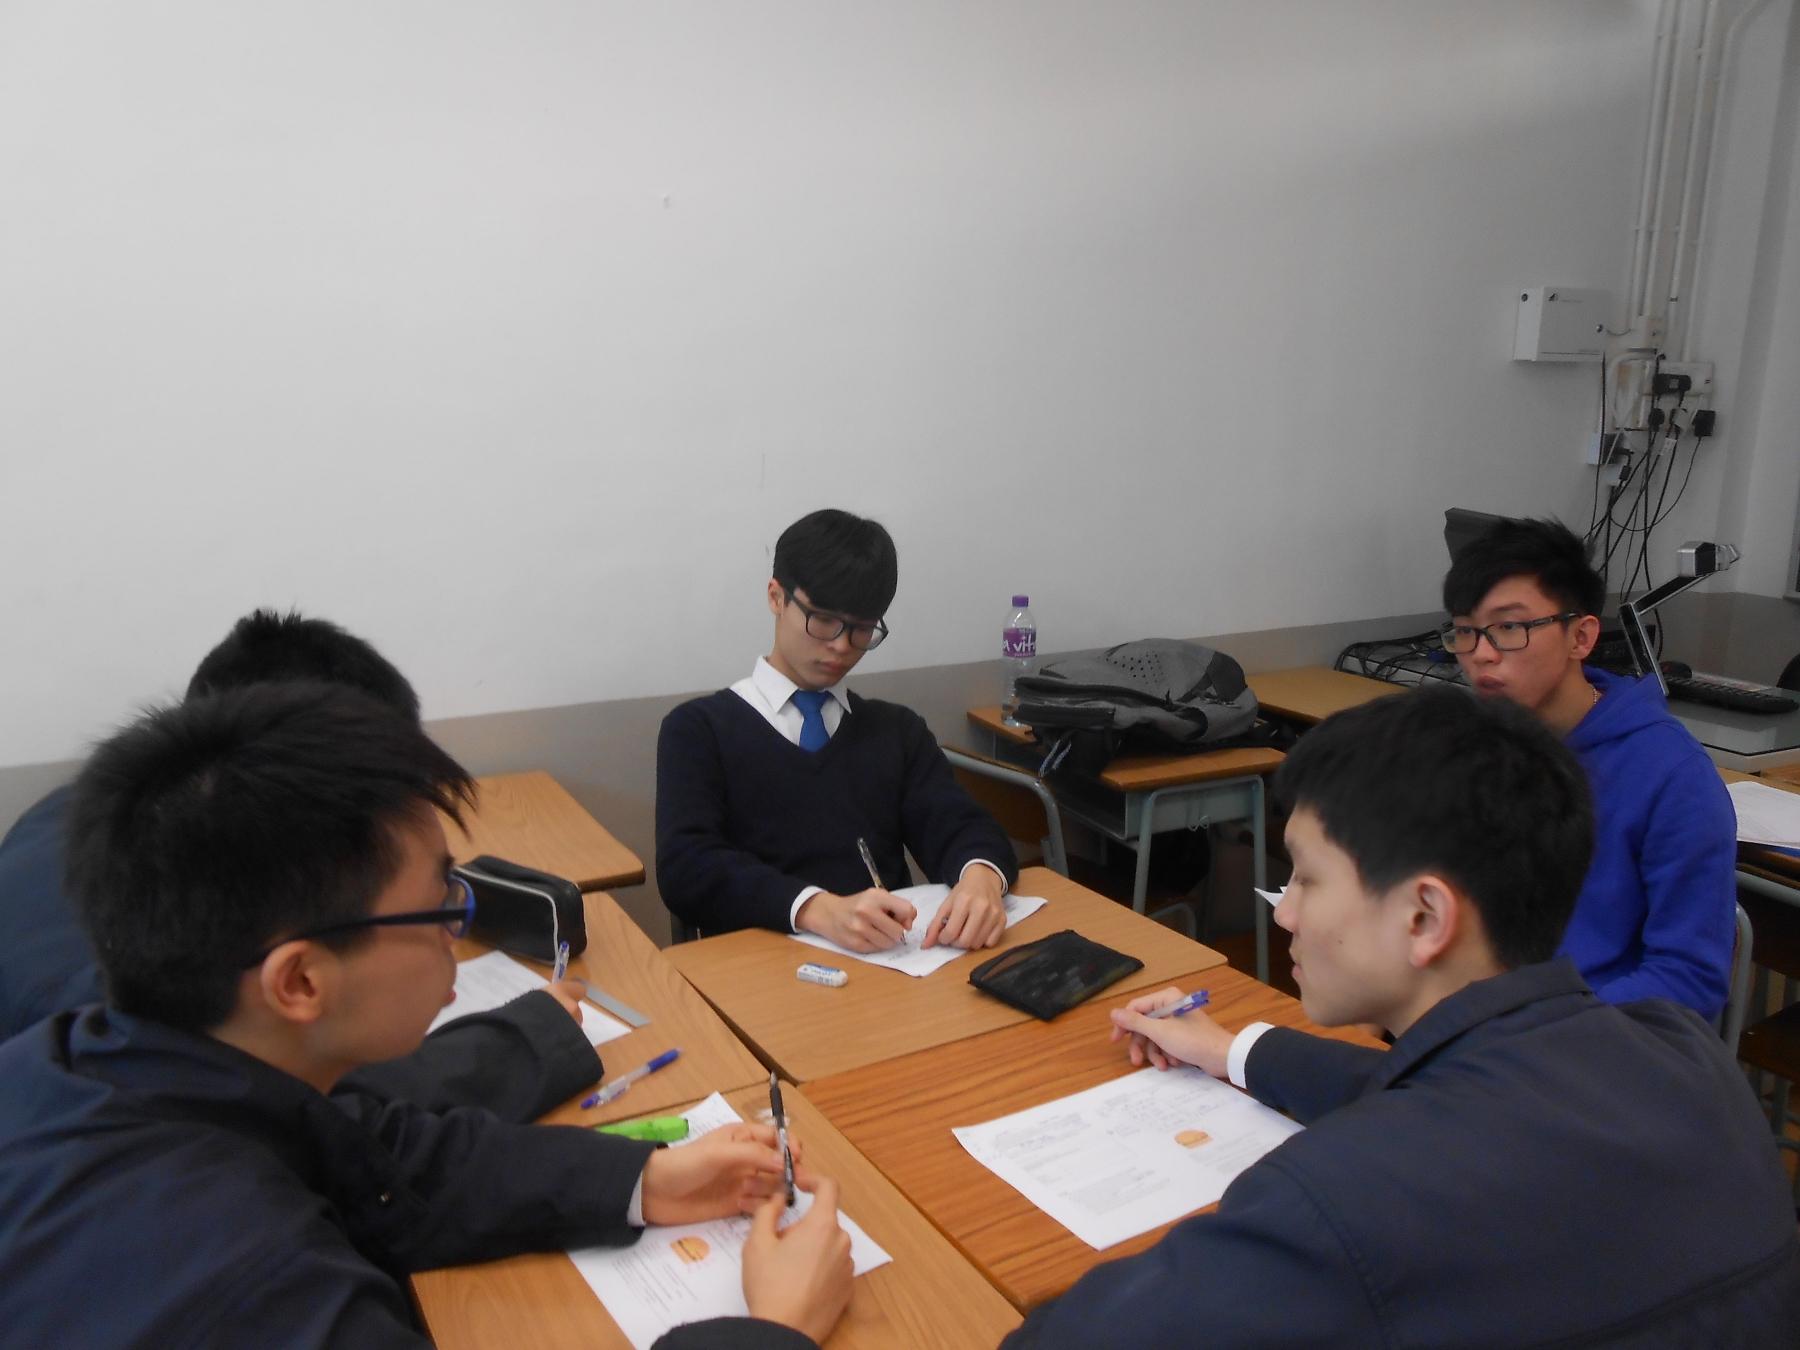 http://npc.edu.hk/sites/default/files/dscn9641.jpg